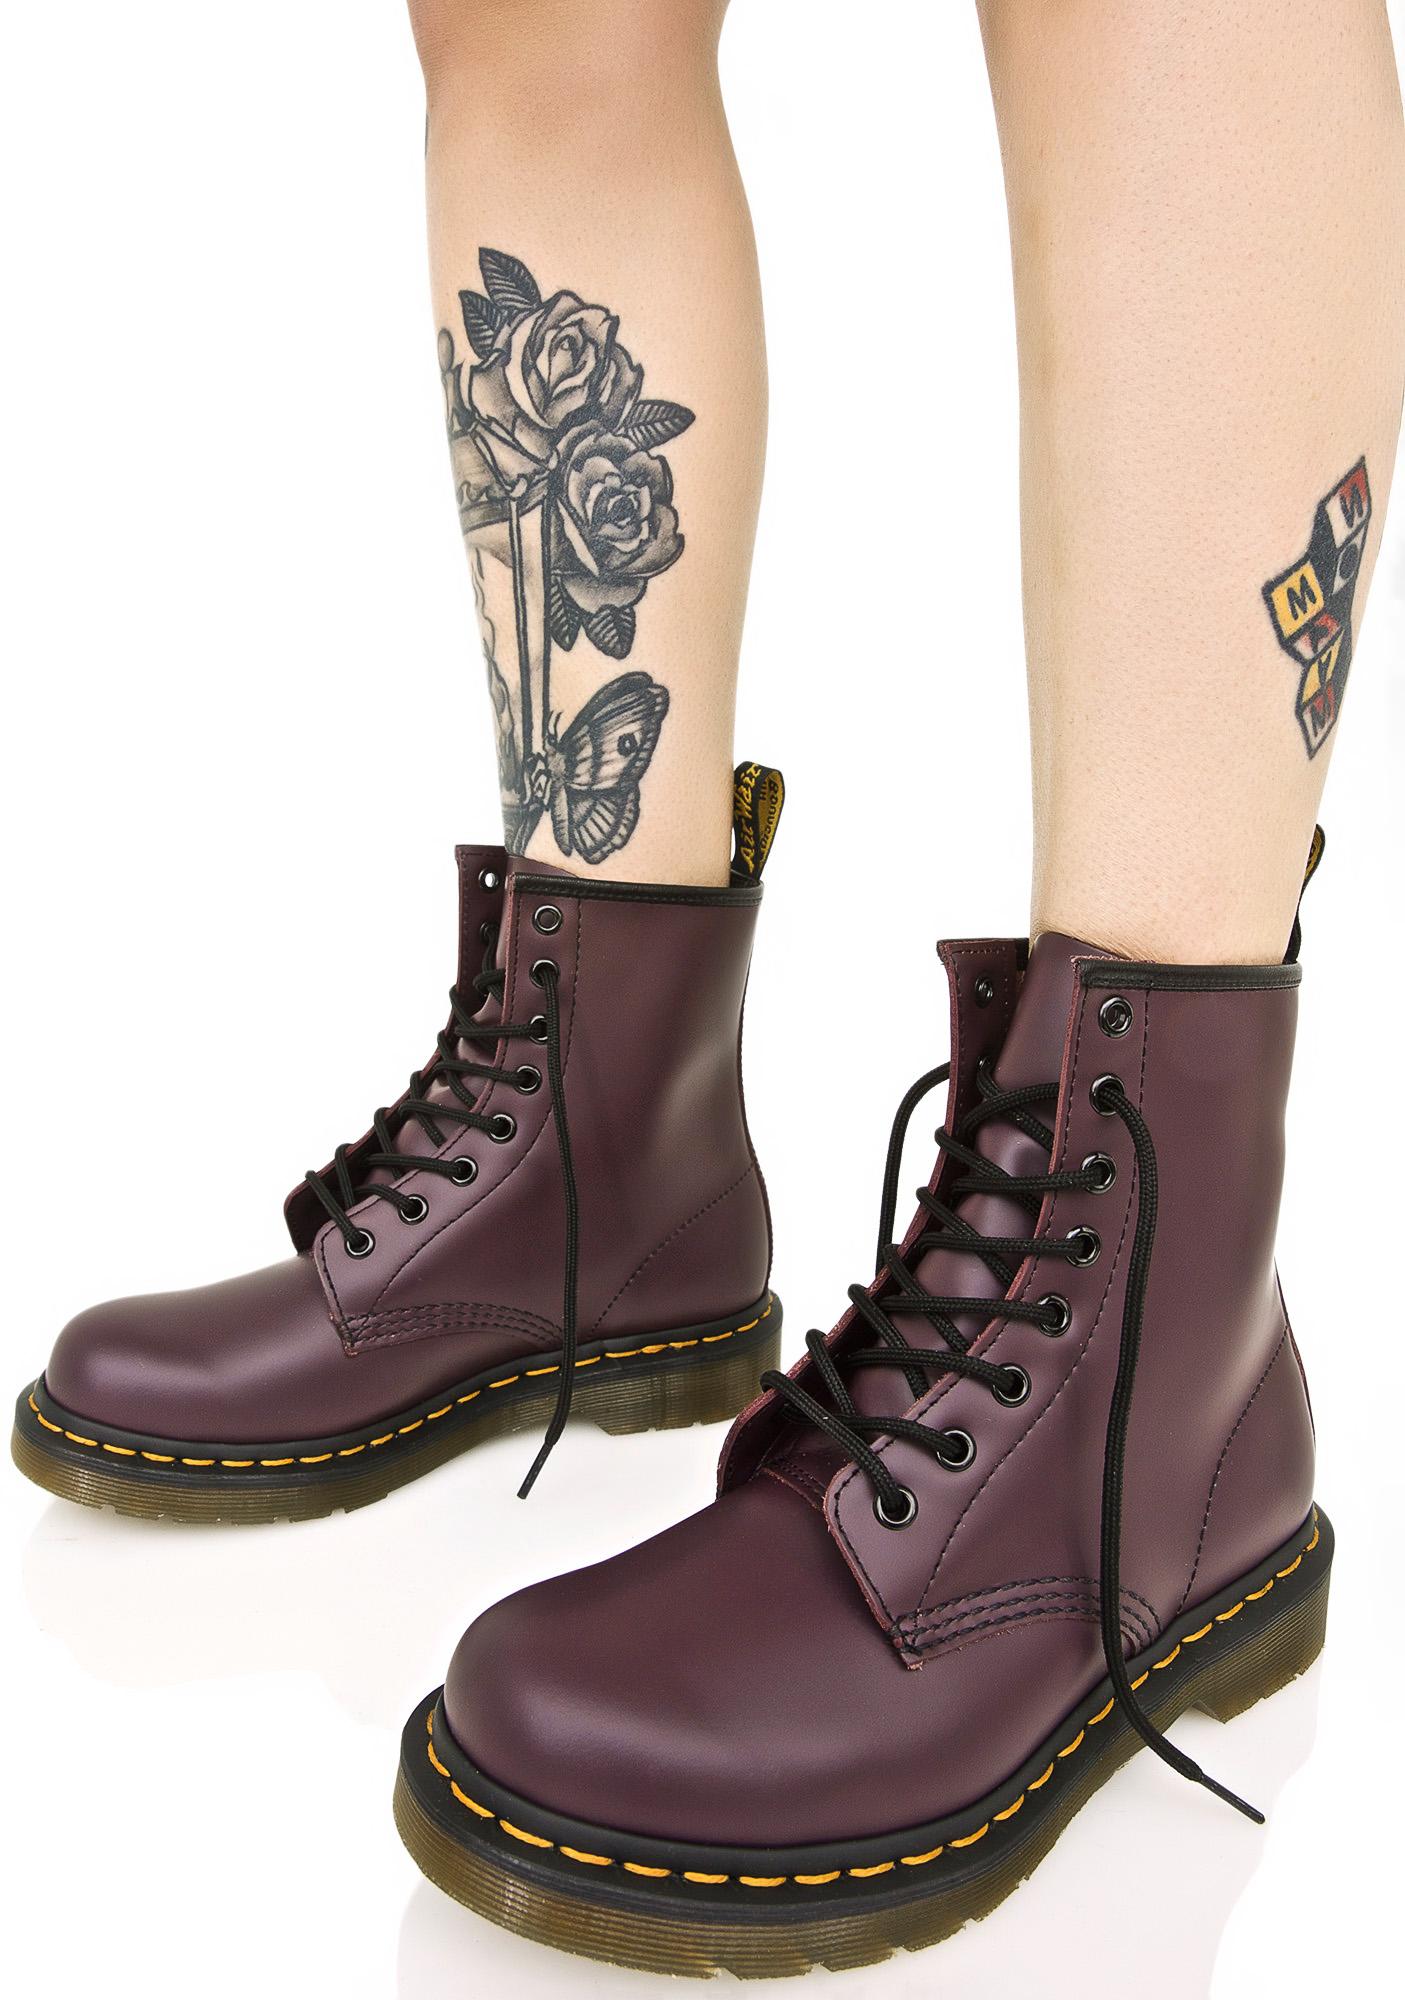 Dr. Martens Royal Purple 1460 8 Eye Boots